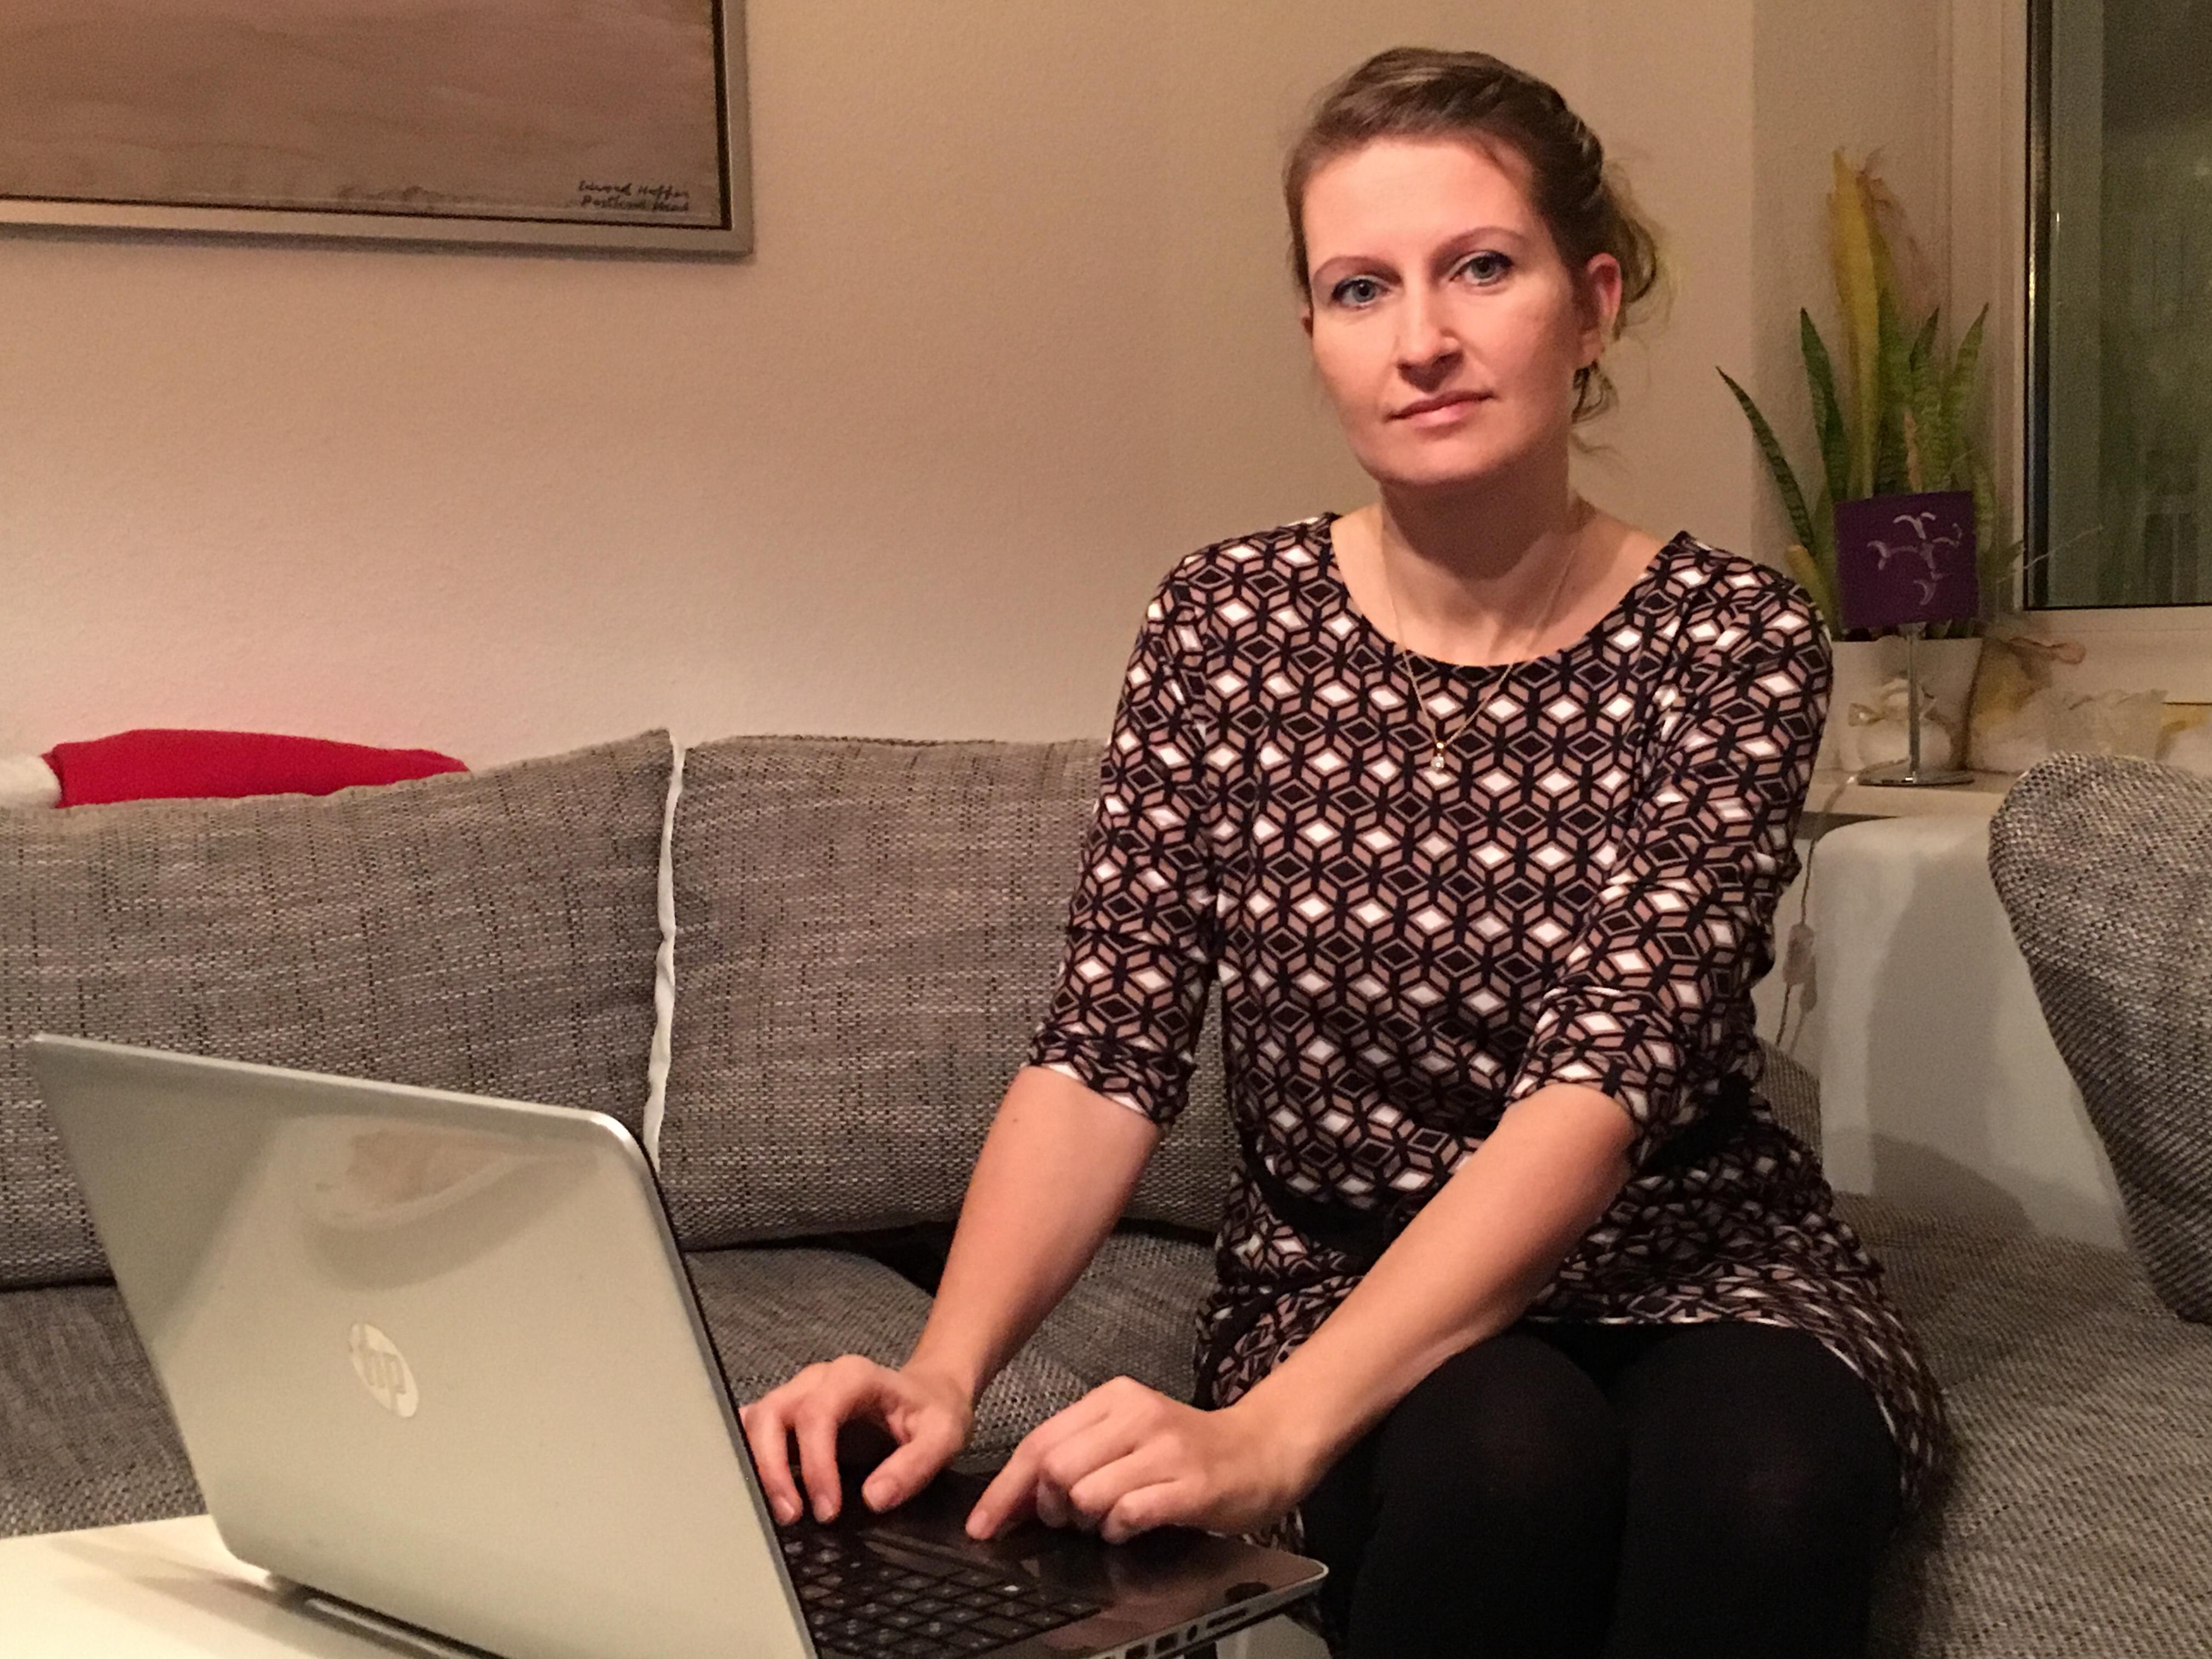 Texterin Katrin Winkler